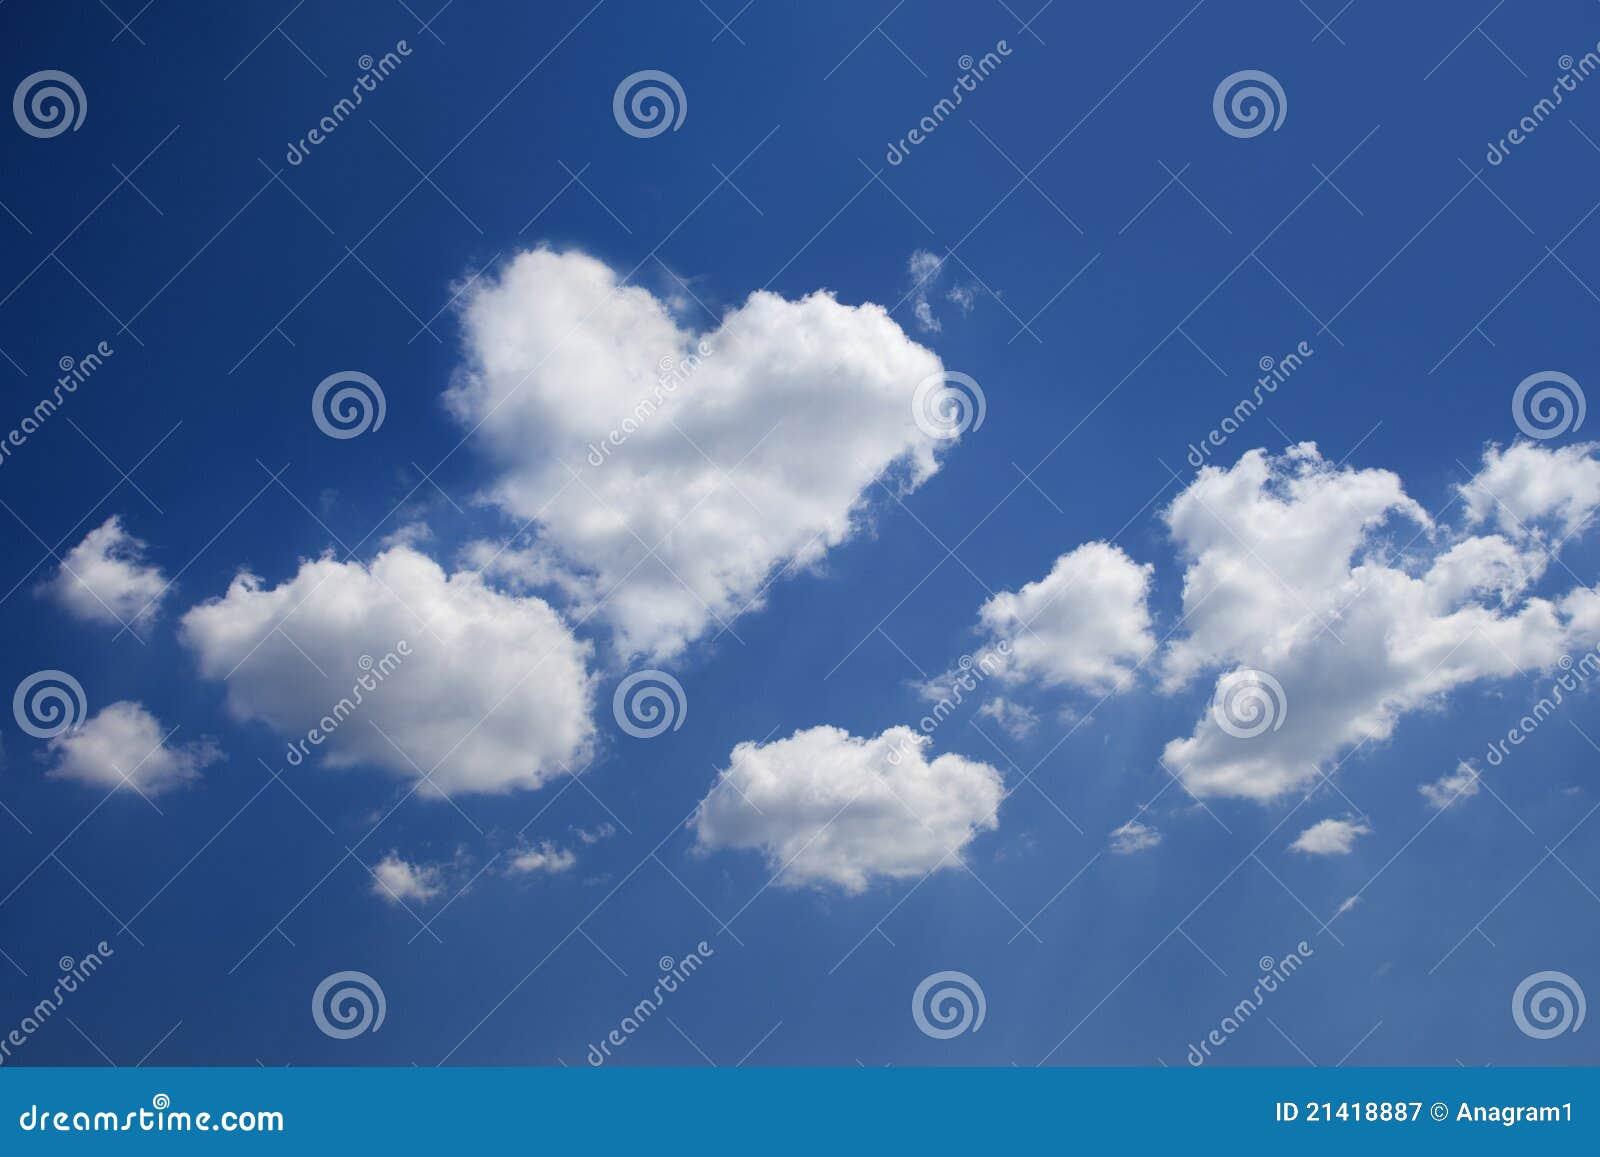 Nuvem Heart-shaped